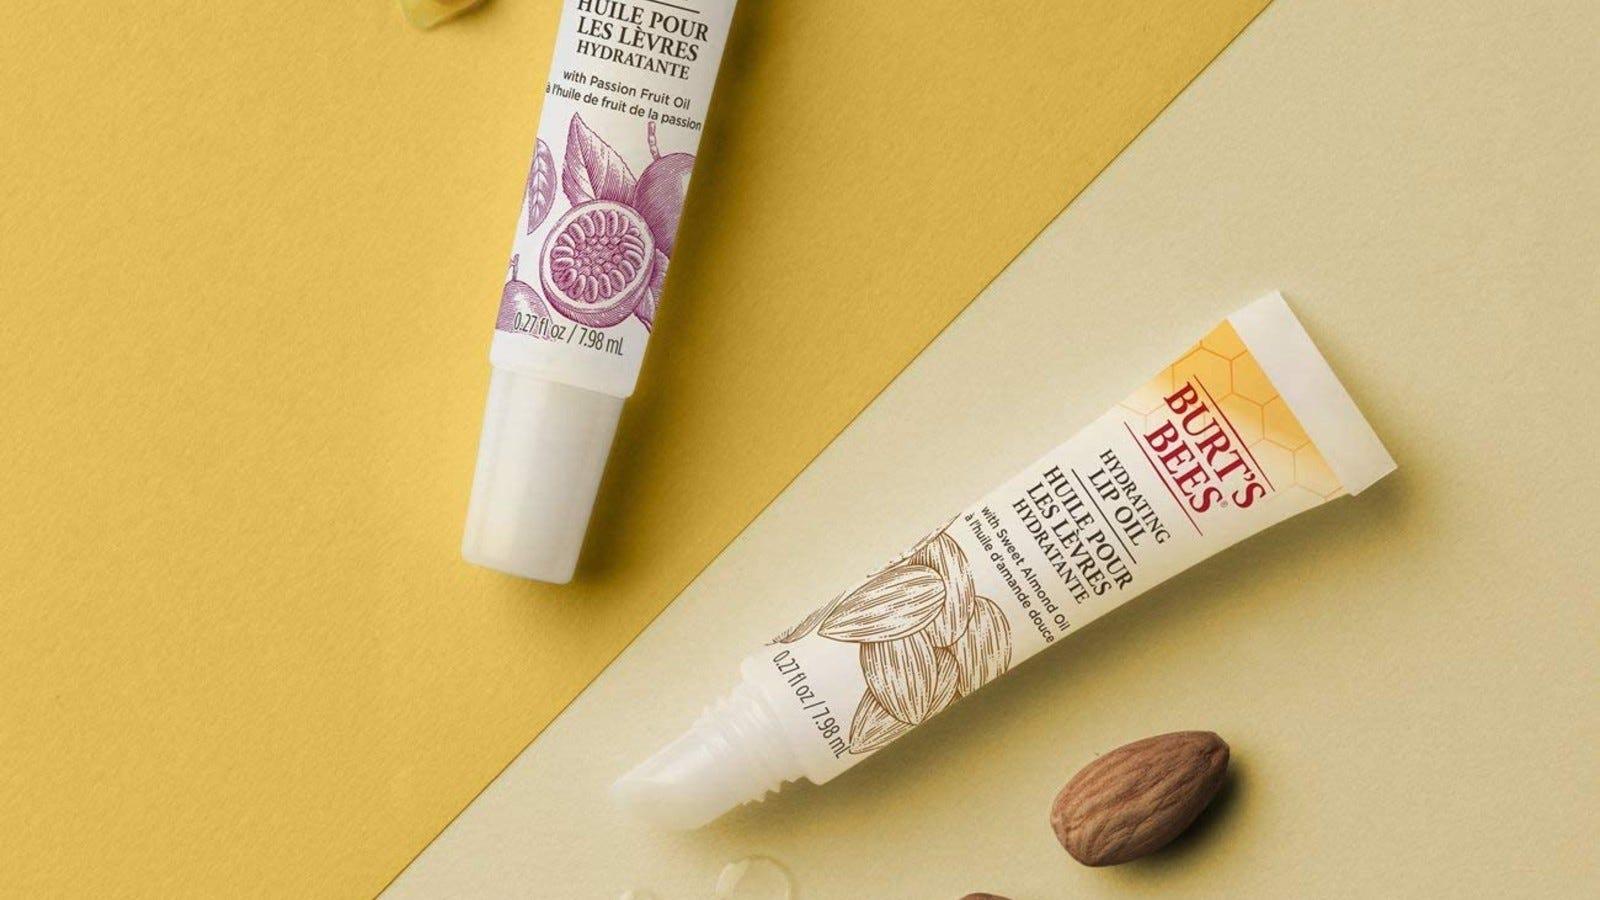 tube of burt's bees lip oil on yellow background